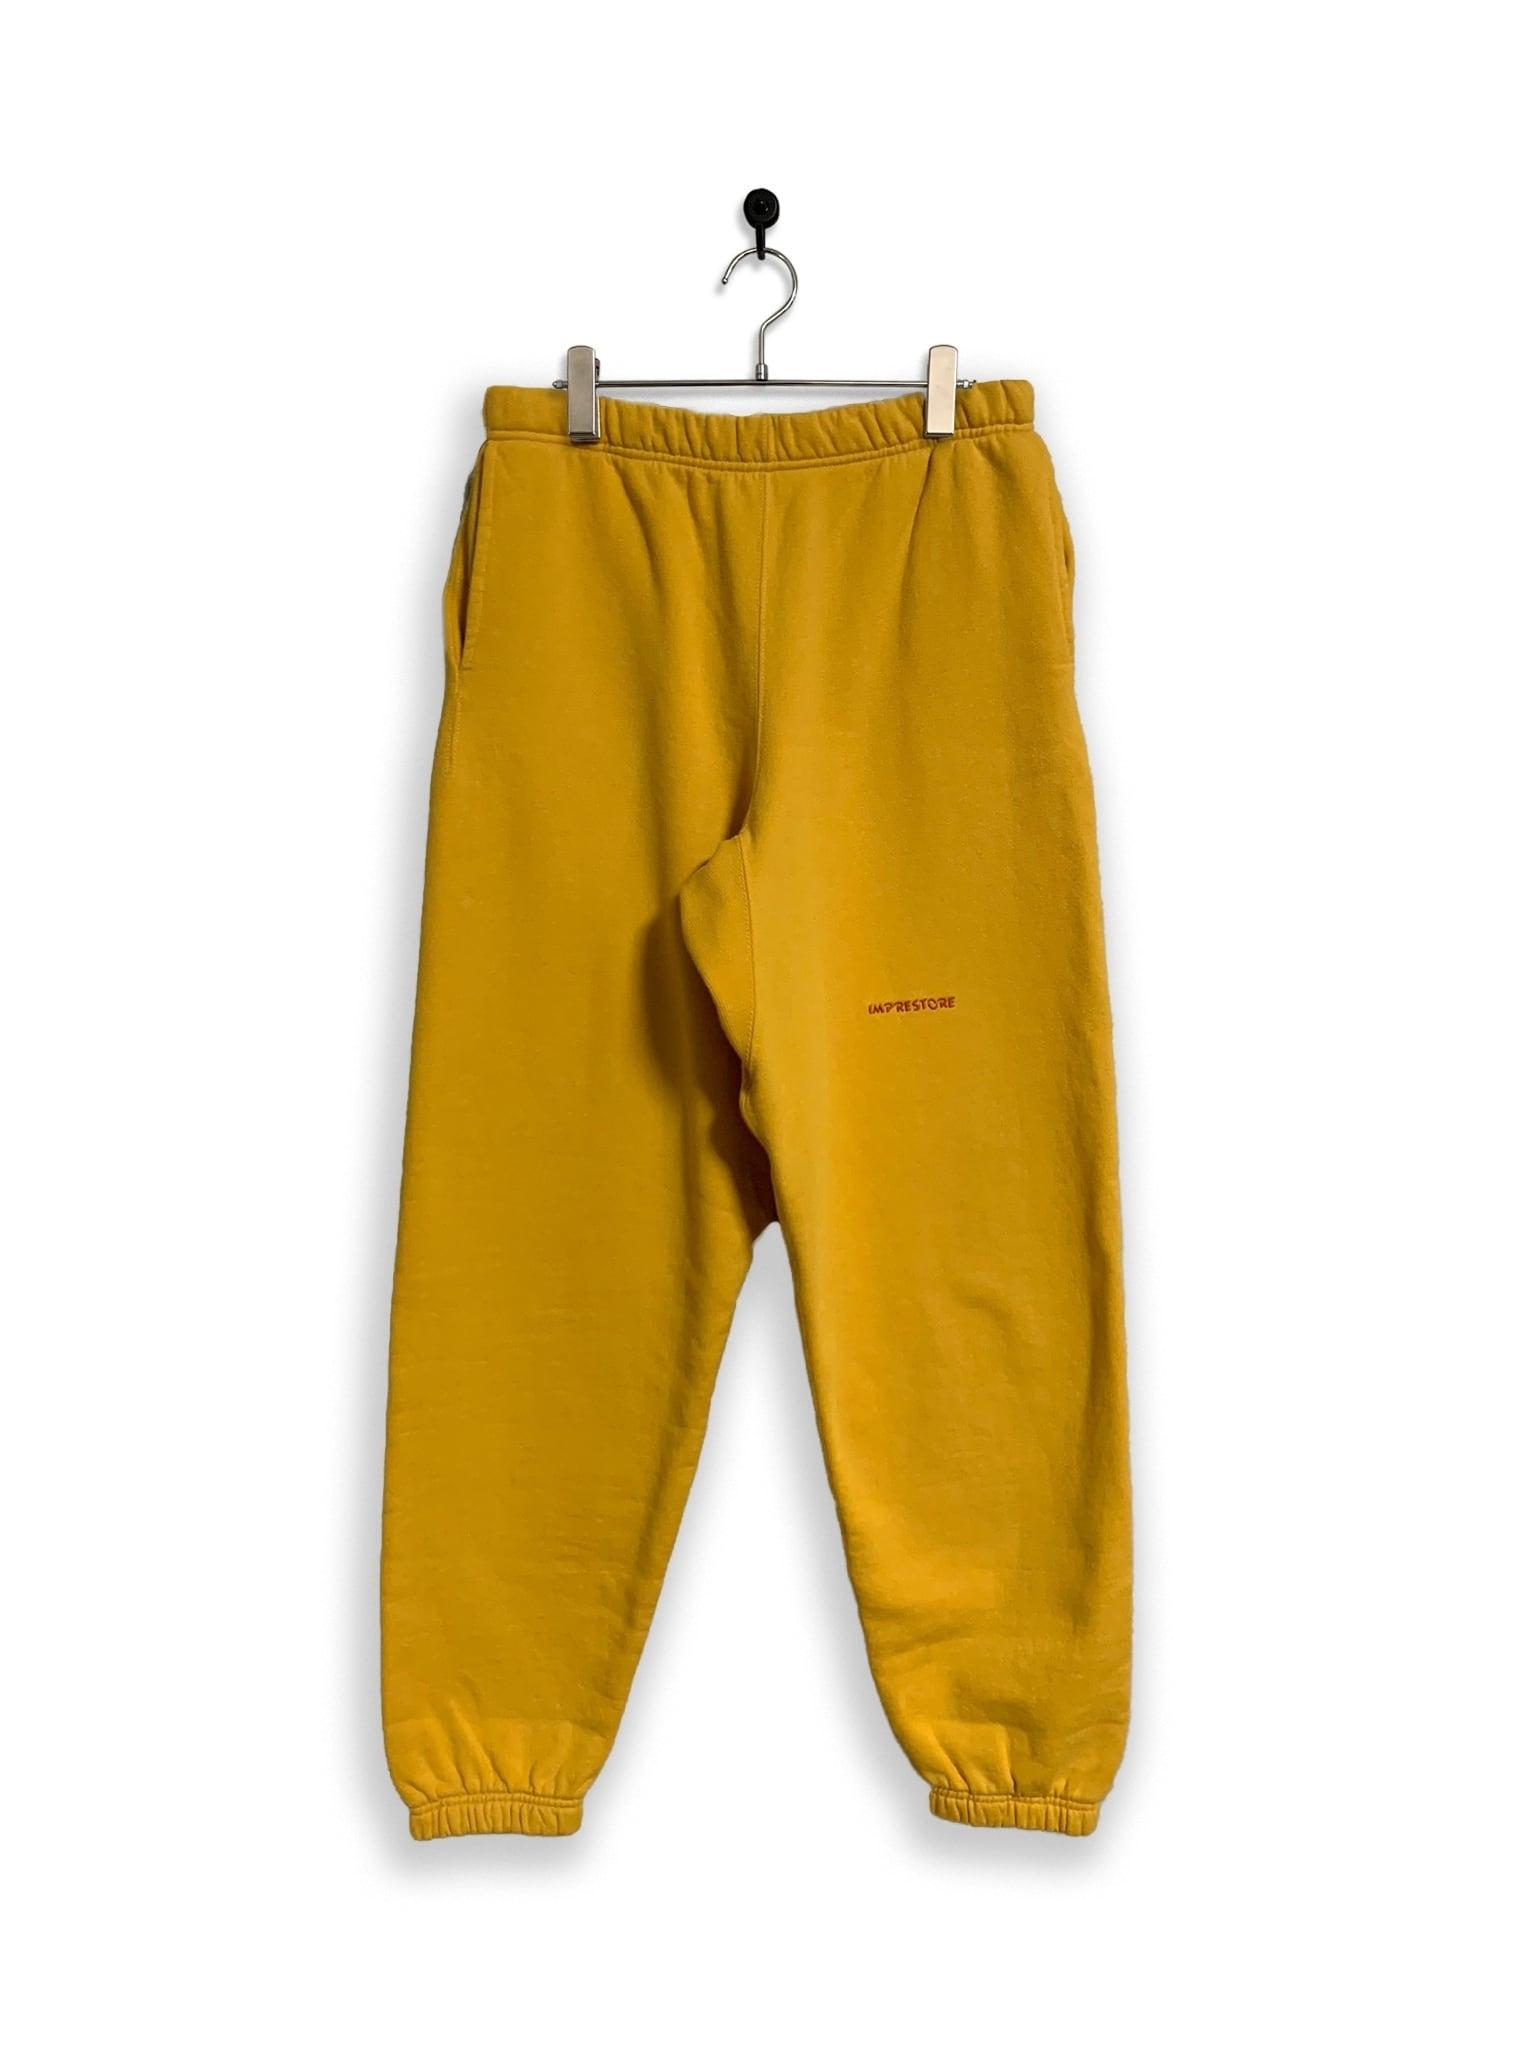 Micky / yellow